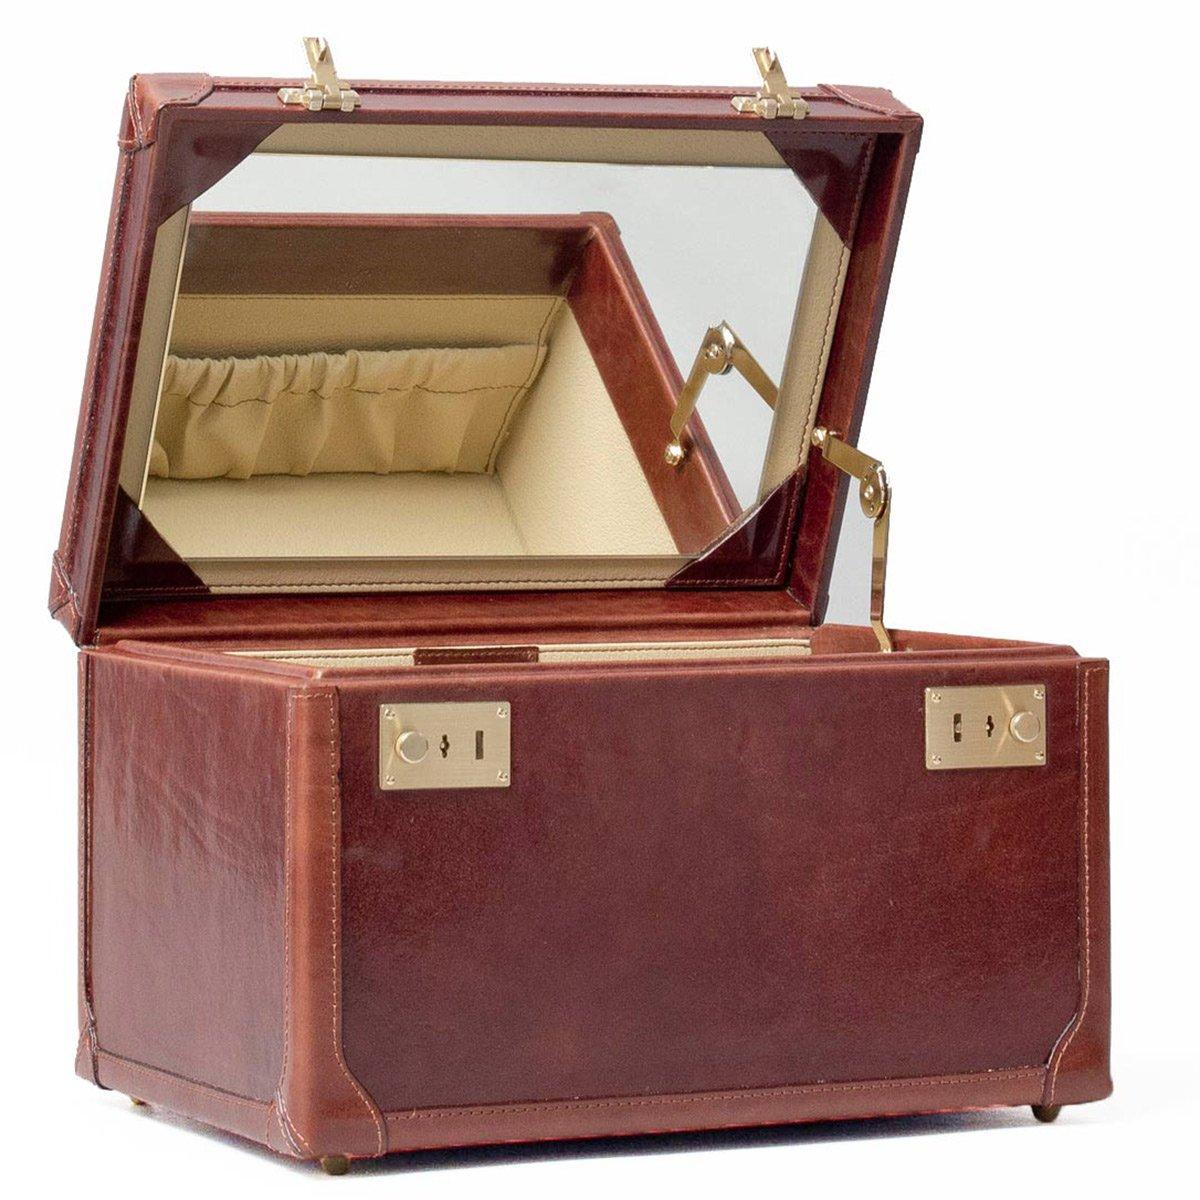 Maxwell Scott© Luxury Tan Leather Vanity Beauty Case (The Bellino) - One Size